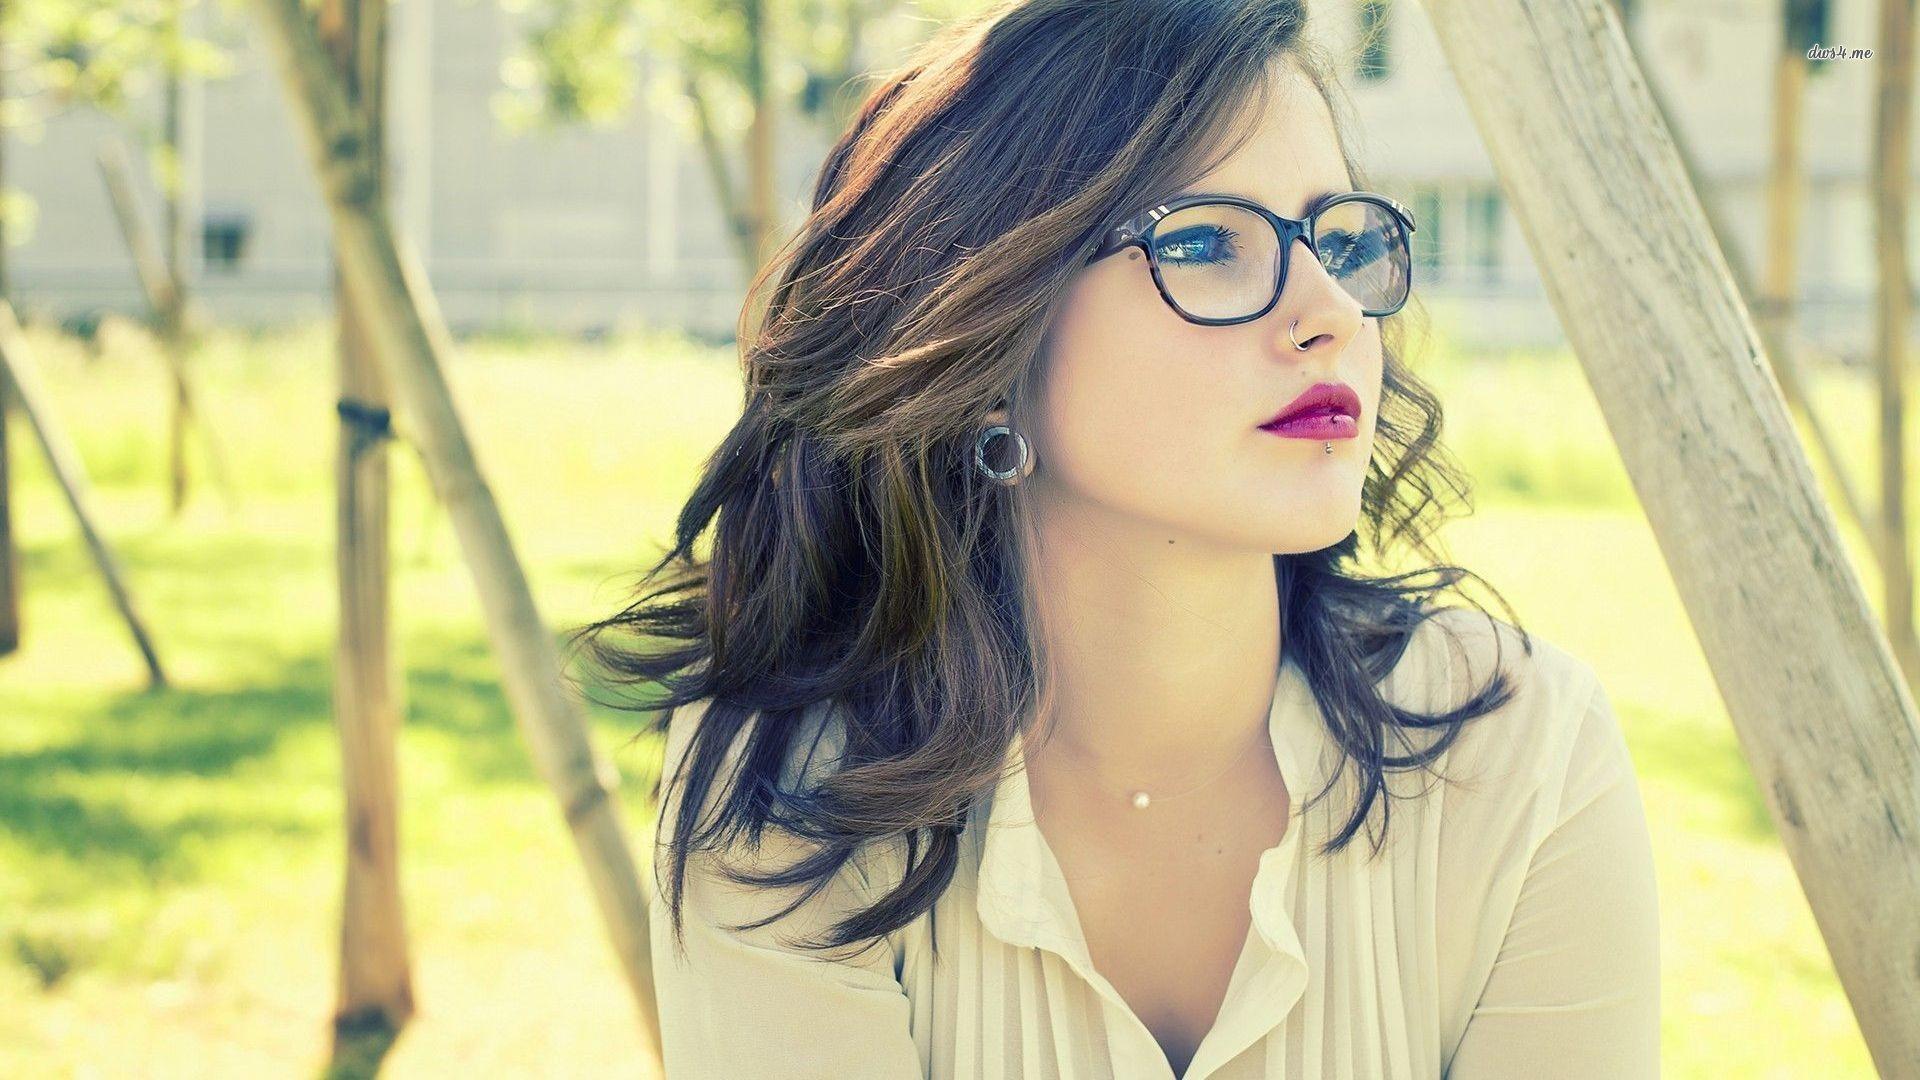 Wallpaper : Face, Model, Long Hair, Women With Glasses